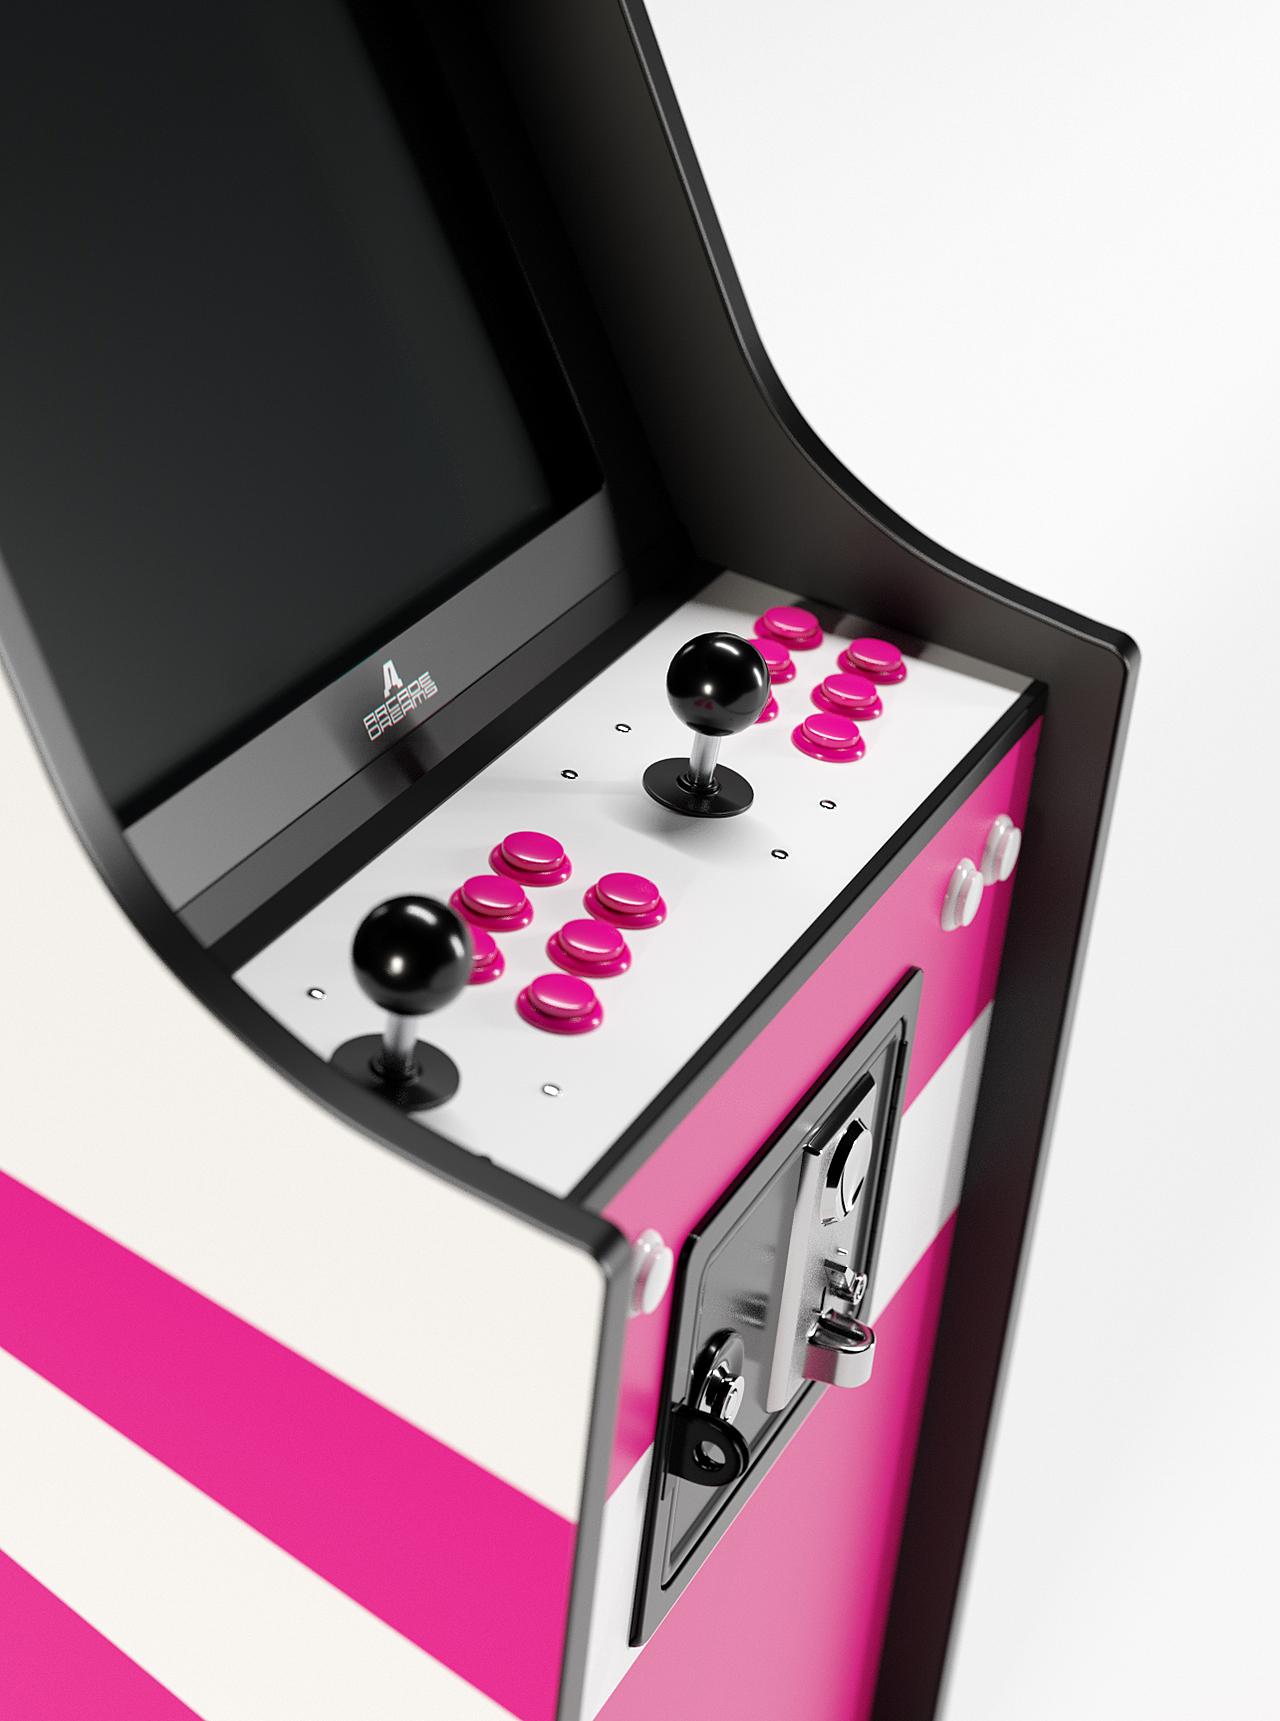 Arcade cabinets